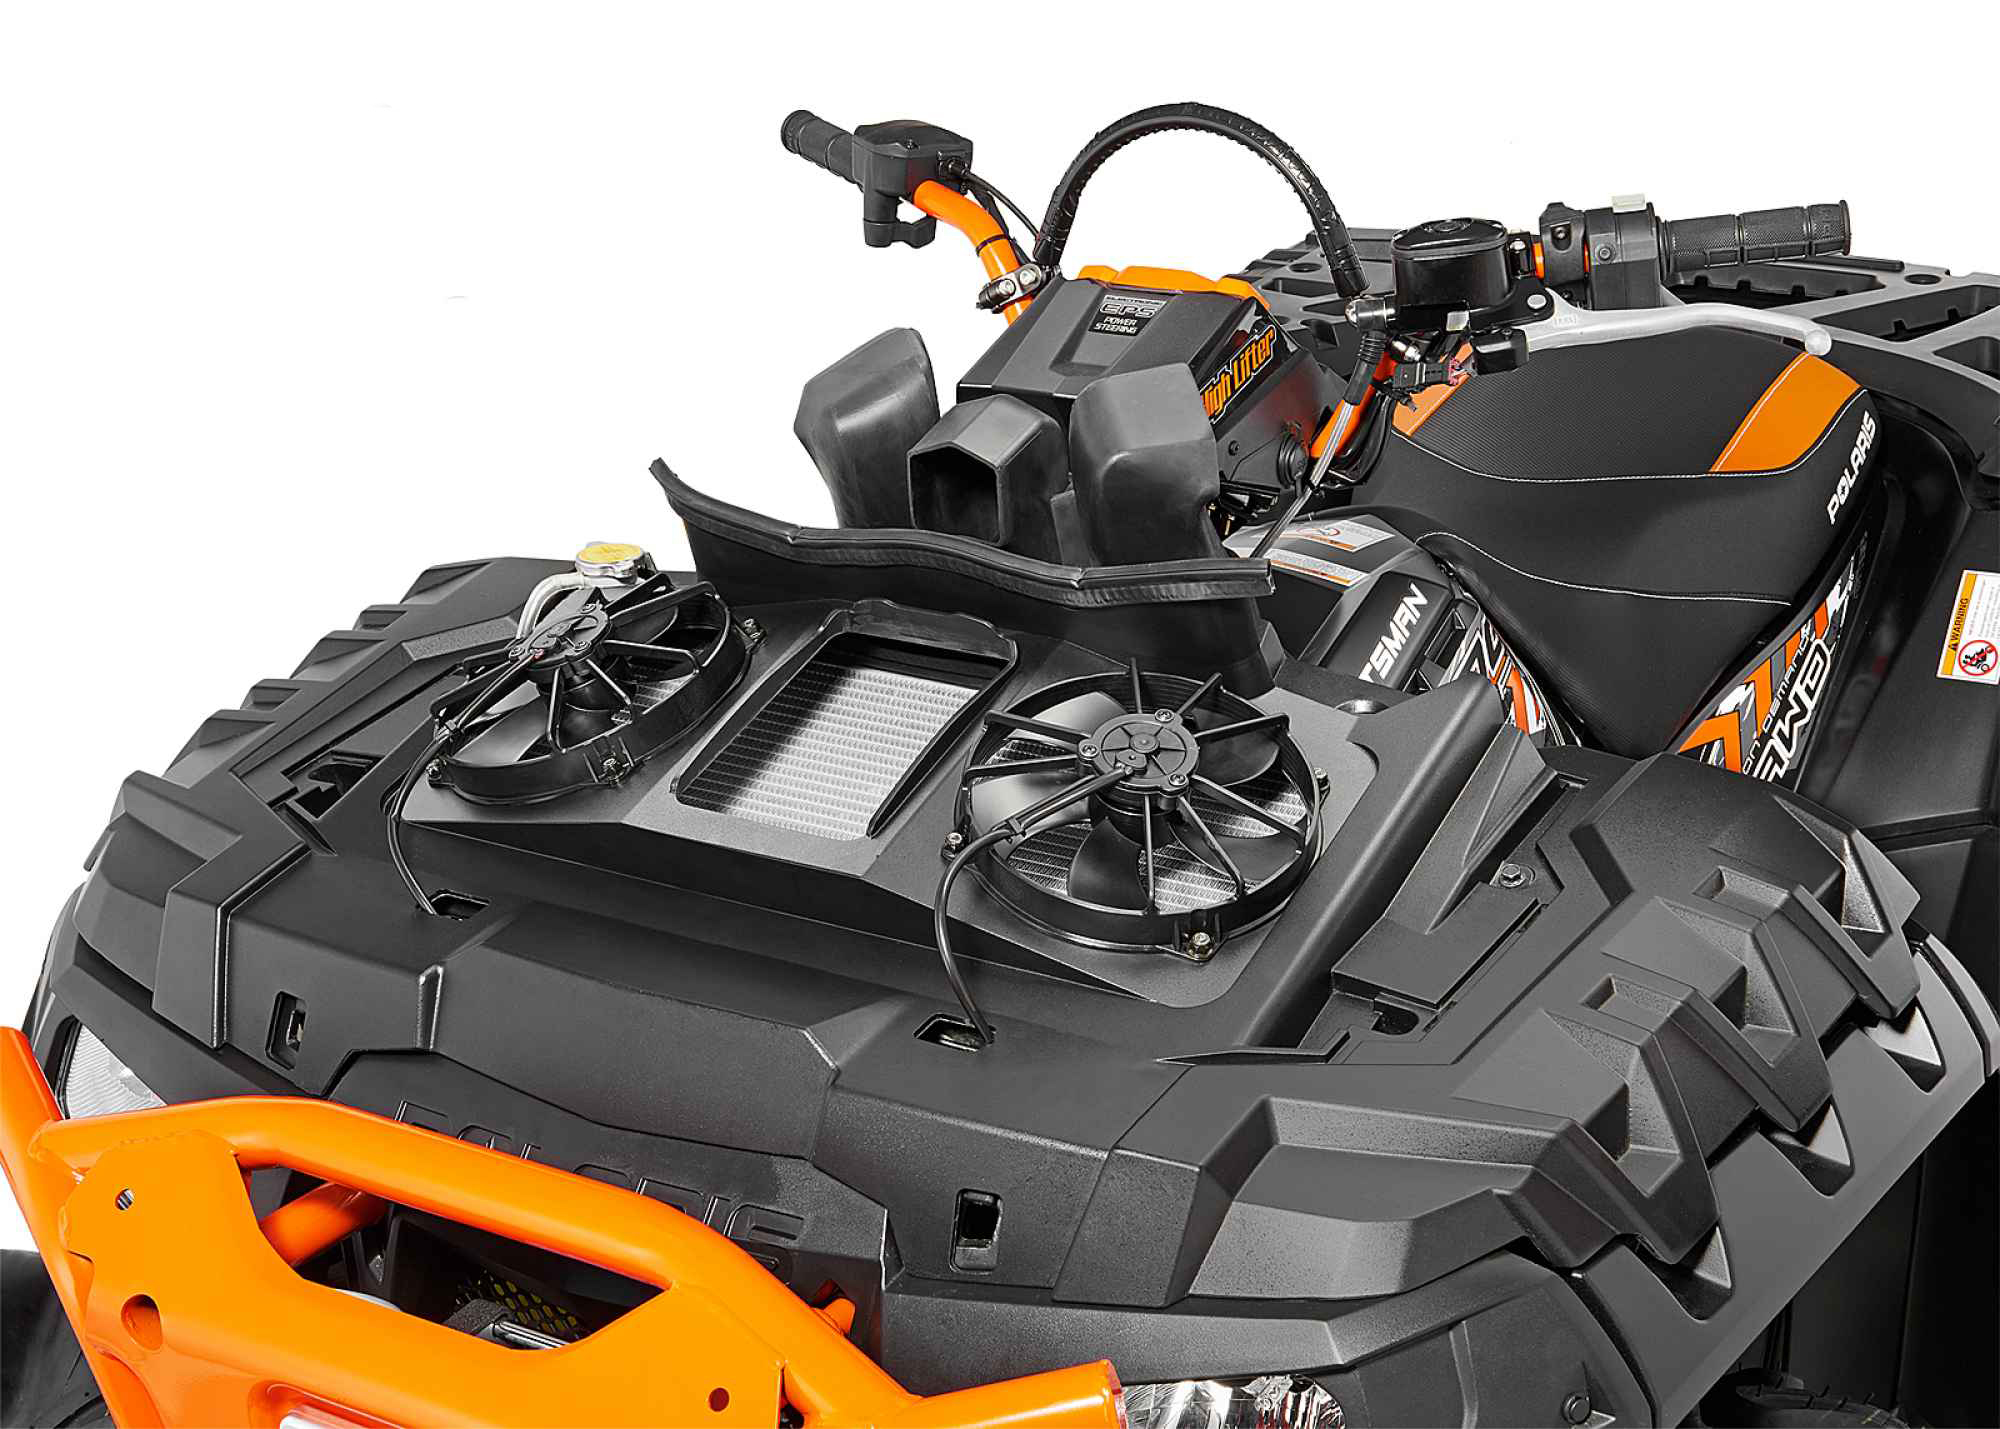 2016-sportsman-xp-1000-highlifter-edition-stealth-black-rack-mounted-radiator.jpg